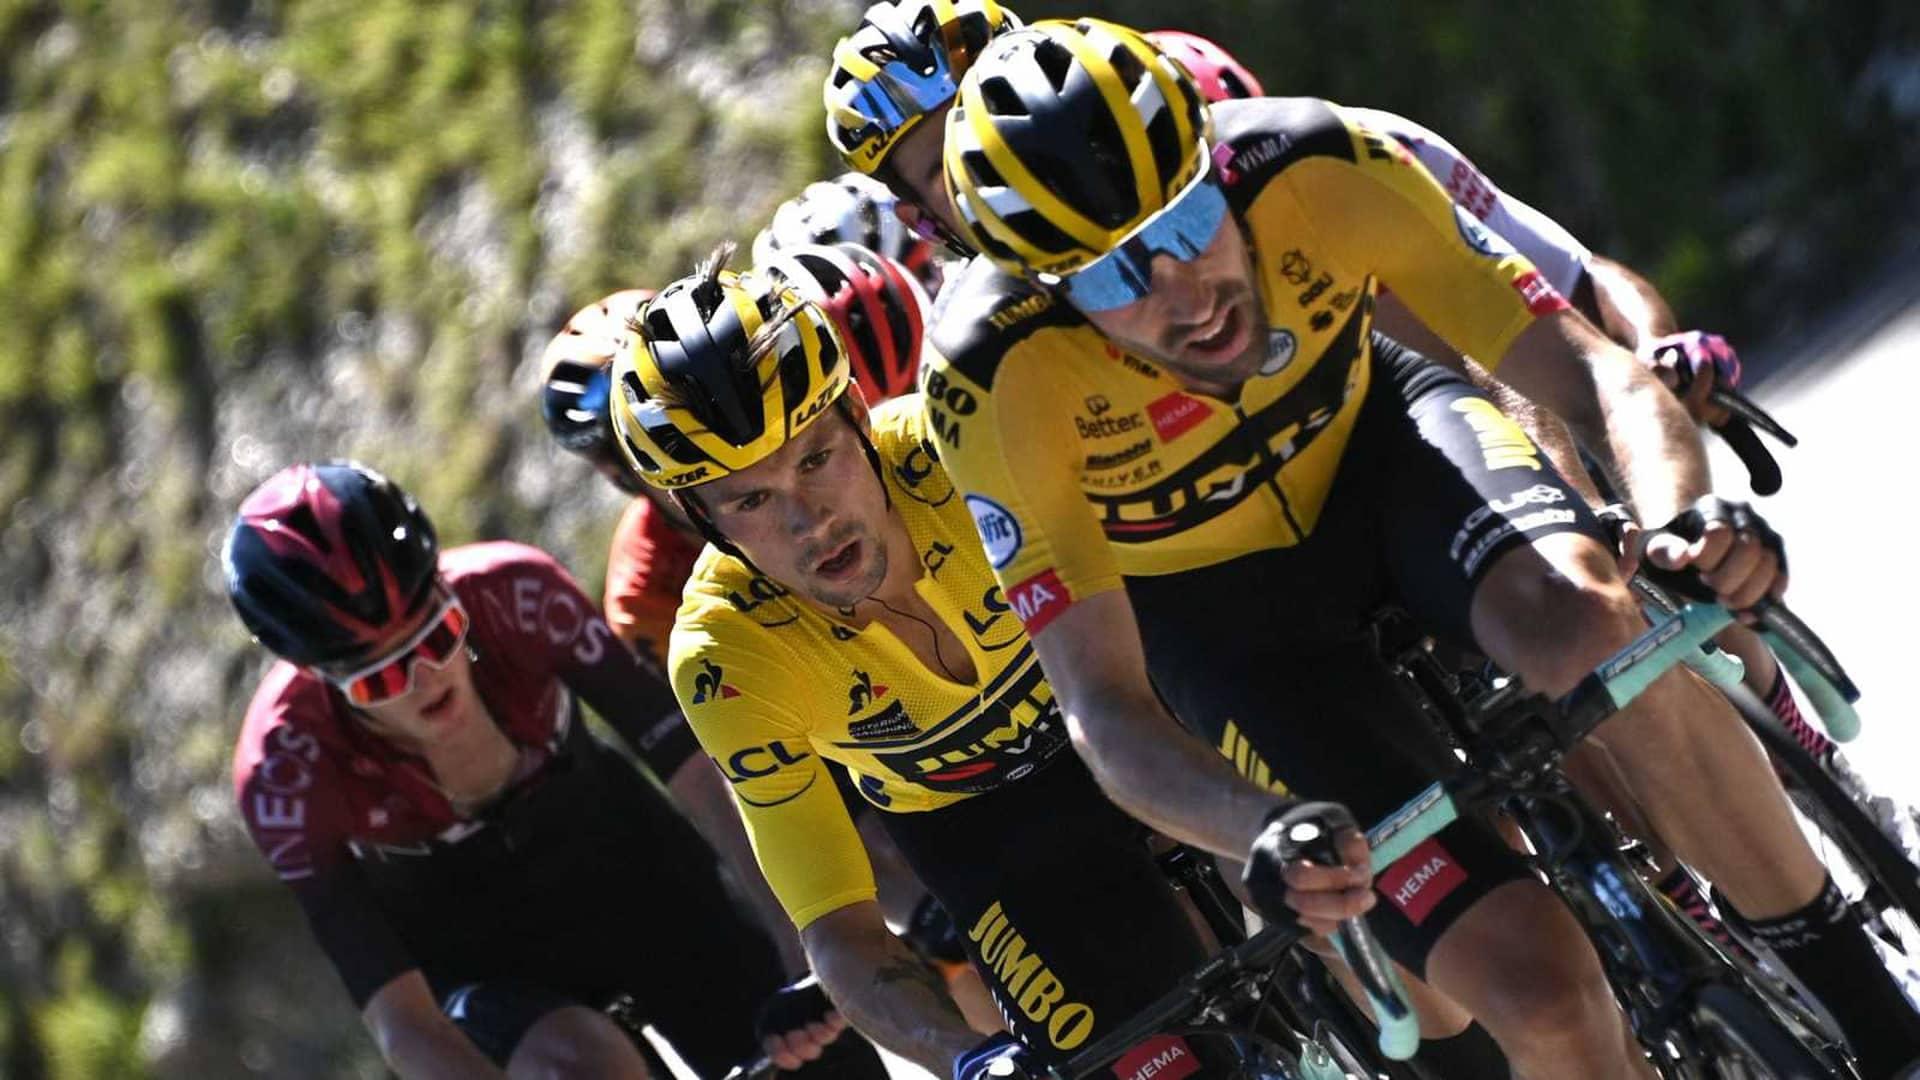 Critérium Dauphiné Libéré 2021: dónde ver en TV, clasificación, etapas, fechas y ganadores